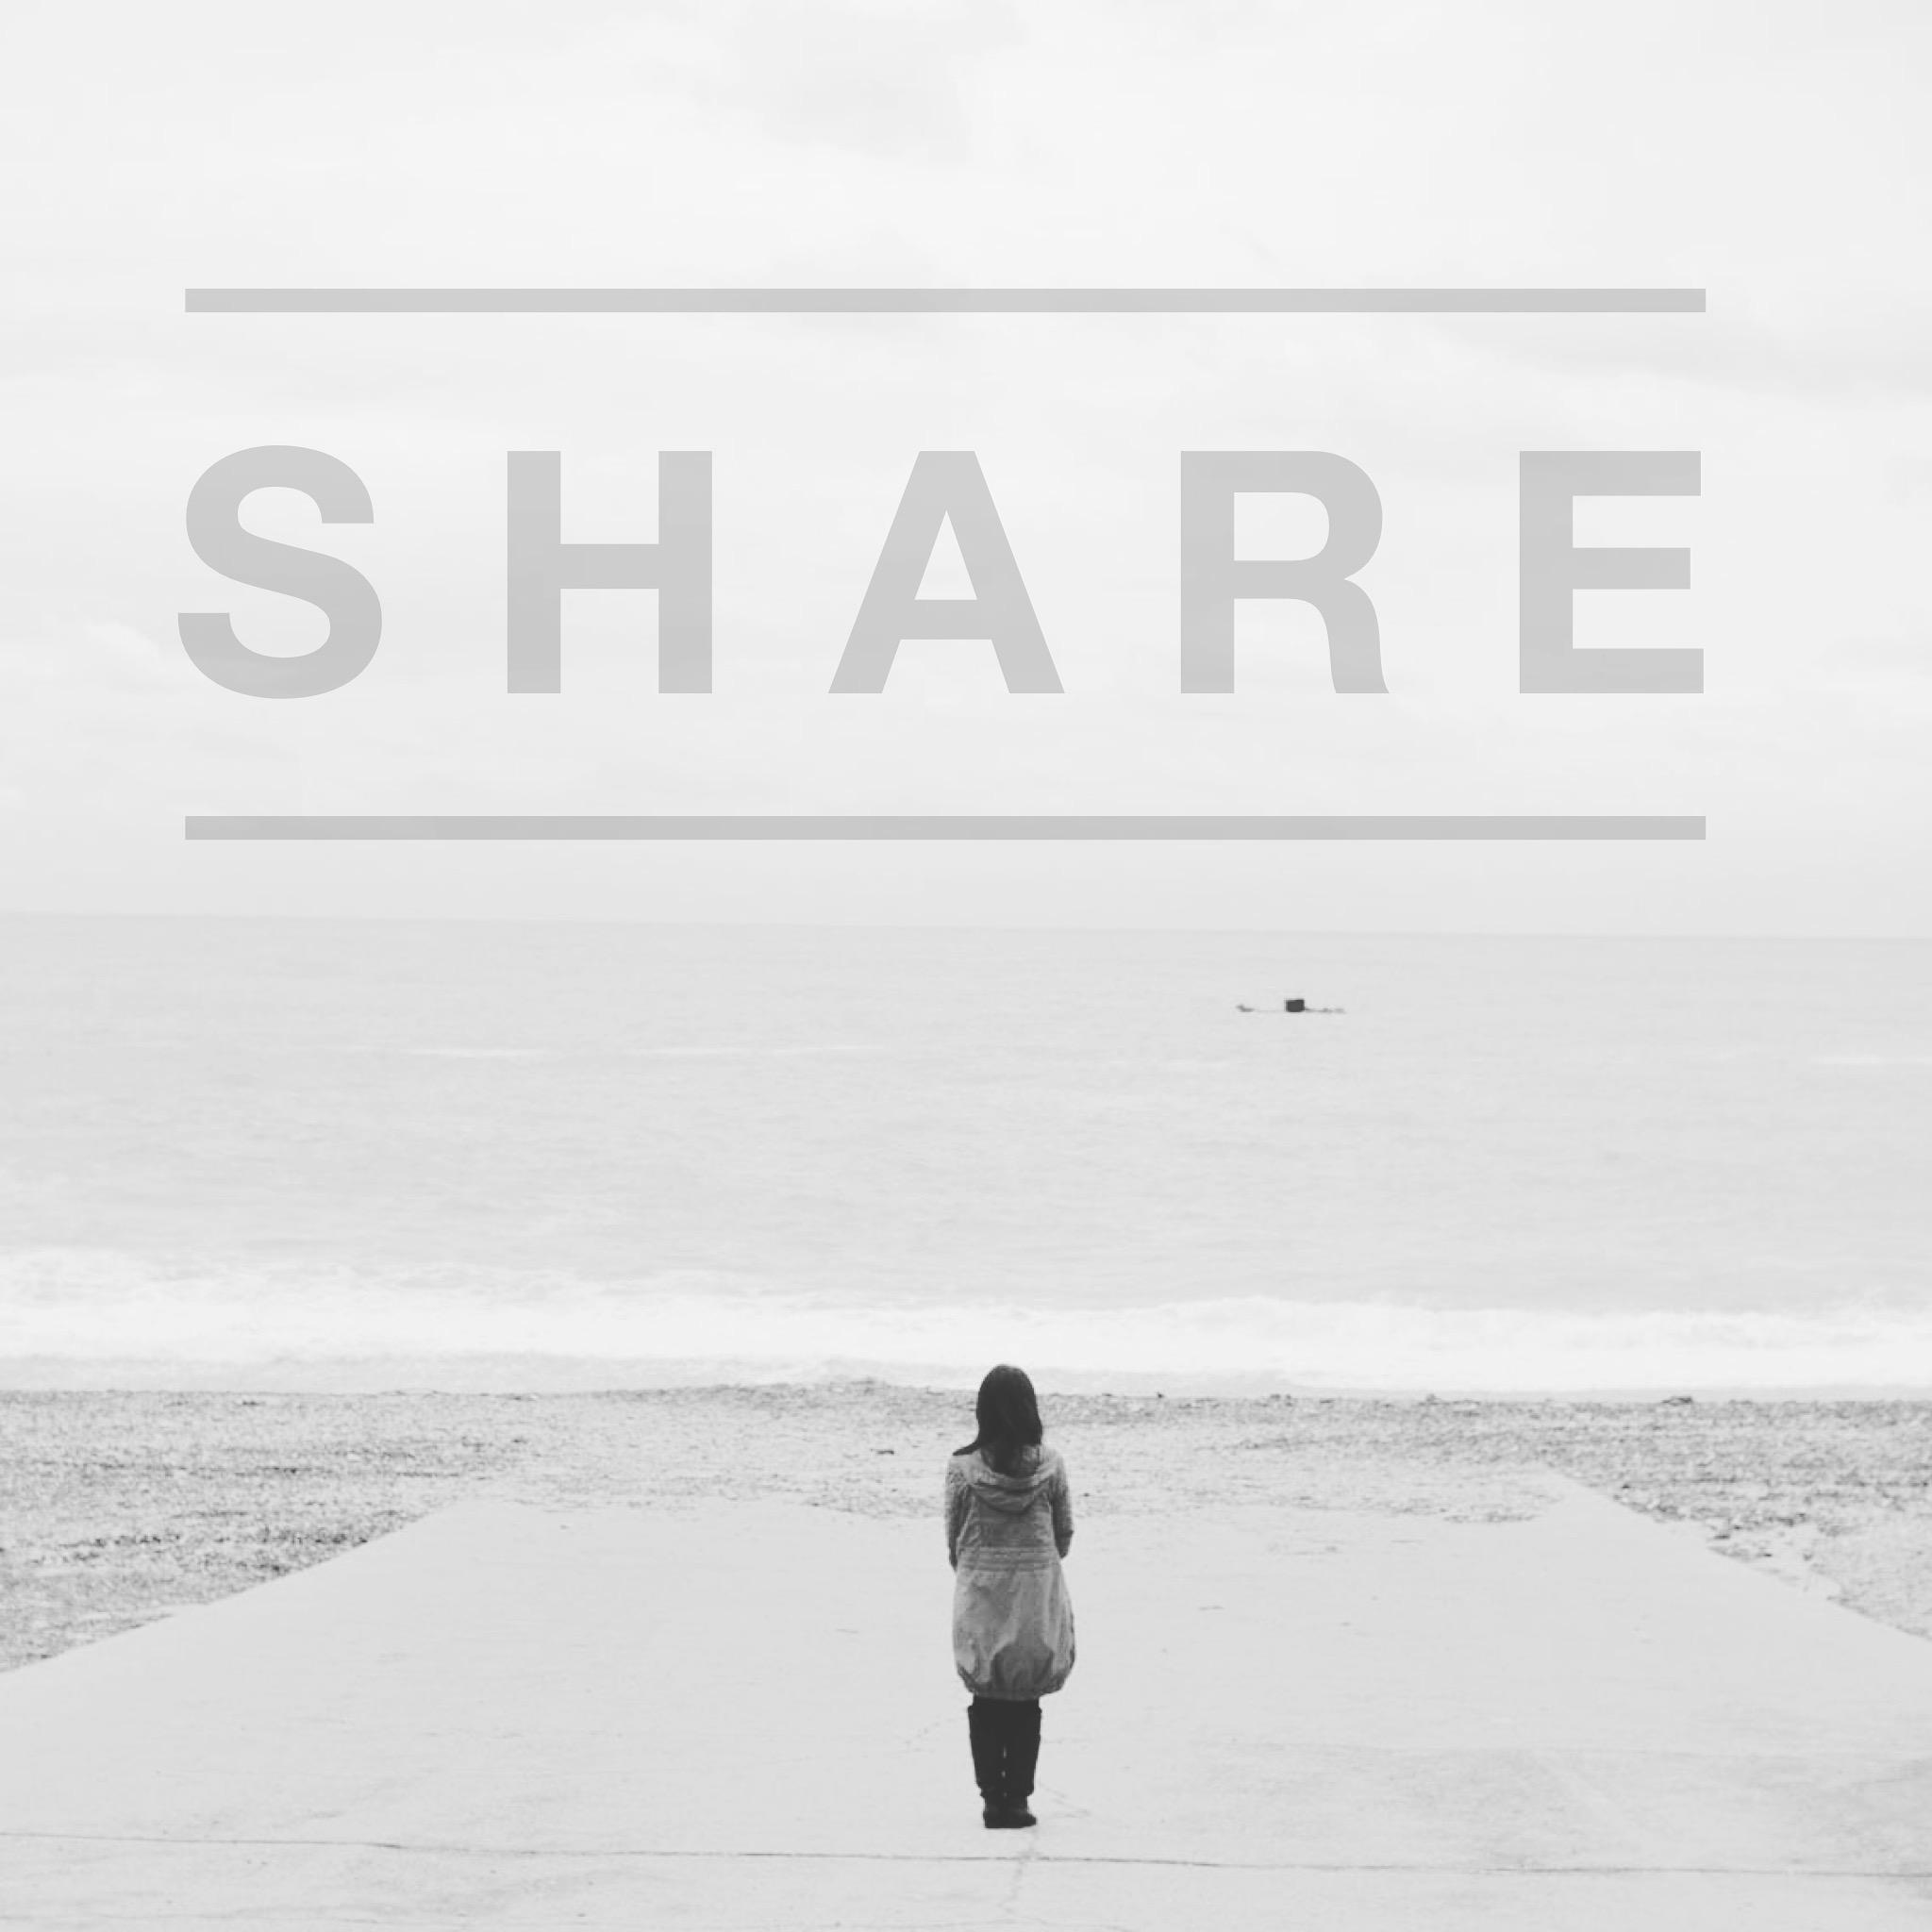 clickforhope share